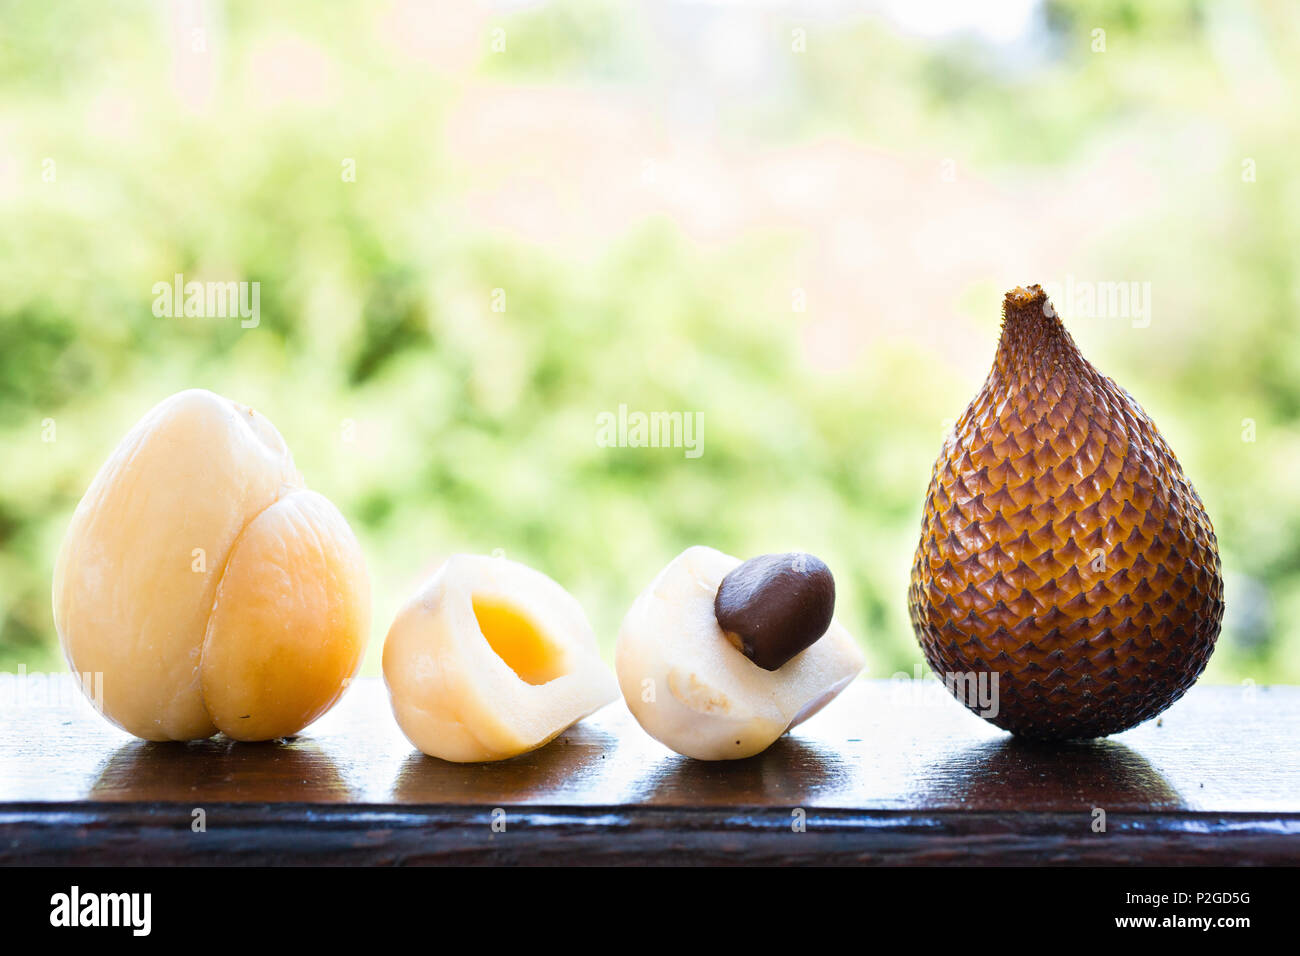 Salak fruit, snake fruit, peeled and open, Sidemen, Bali, Indonesia - Stock Image